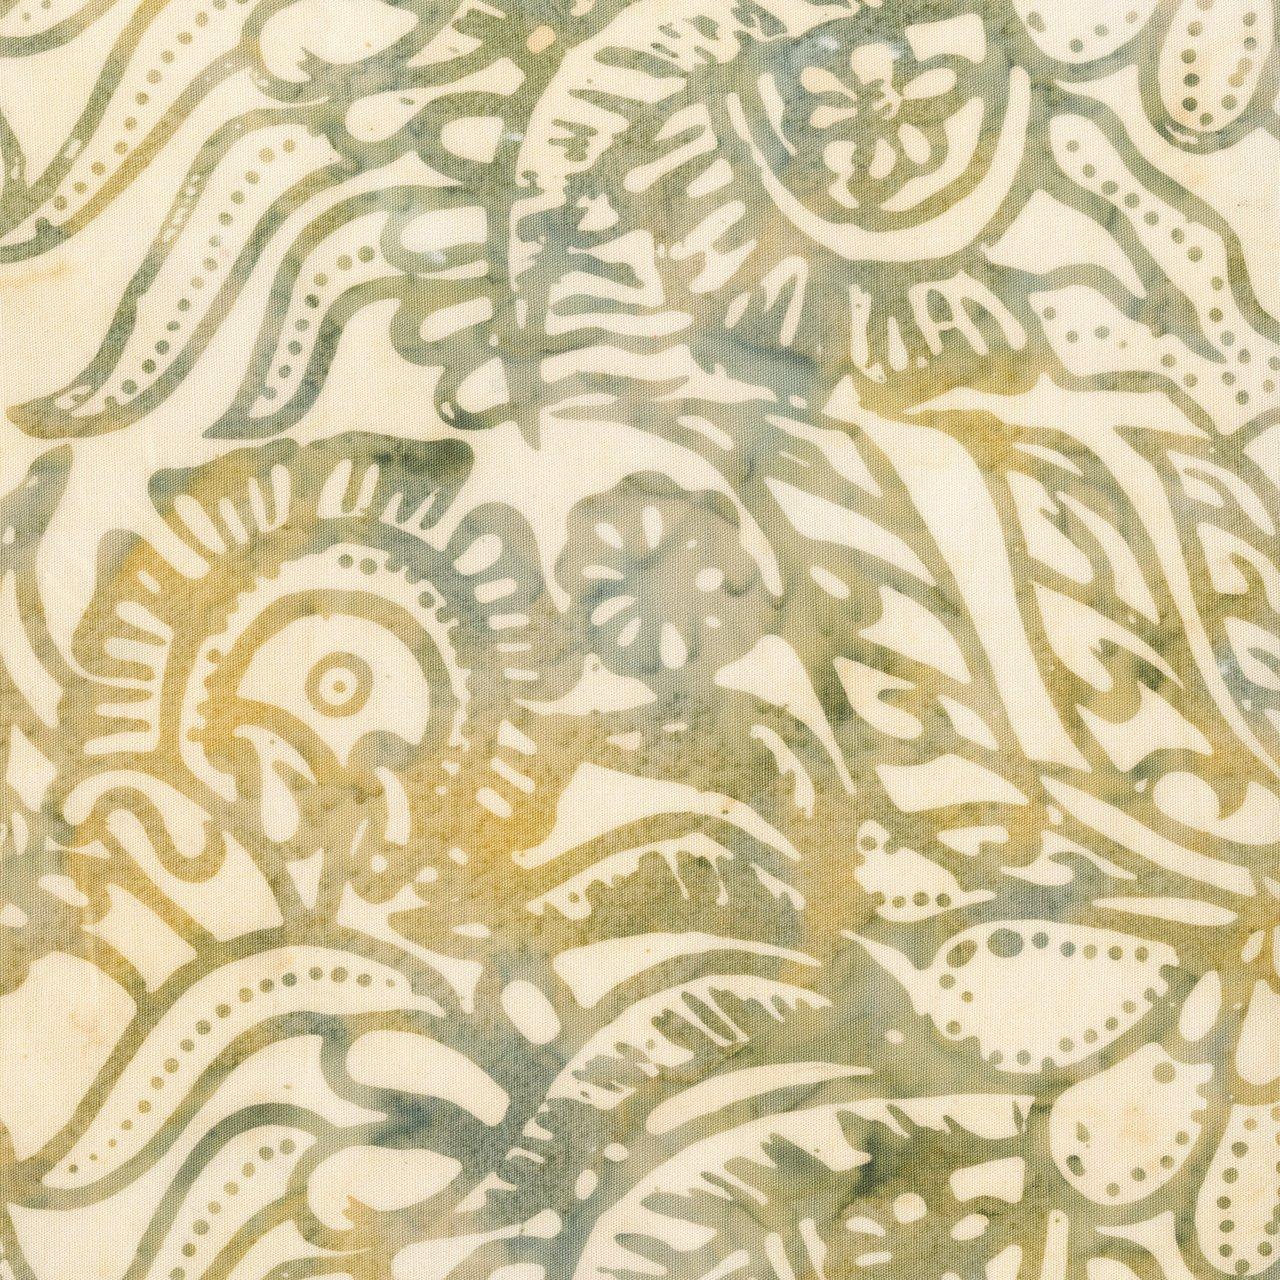 Art Inspired: Beech Trees 220Q-6 Cream